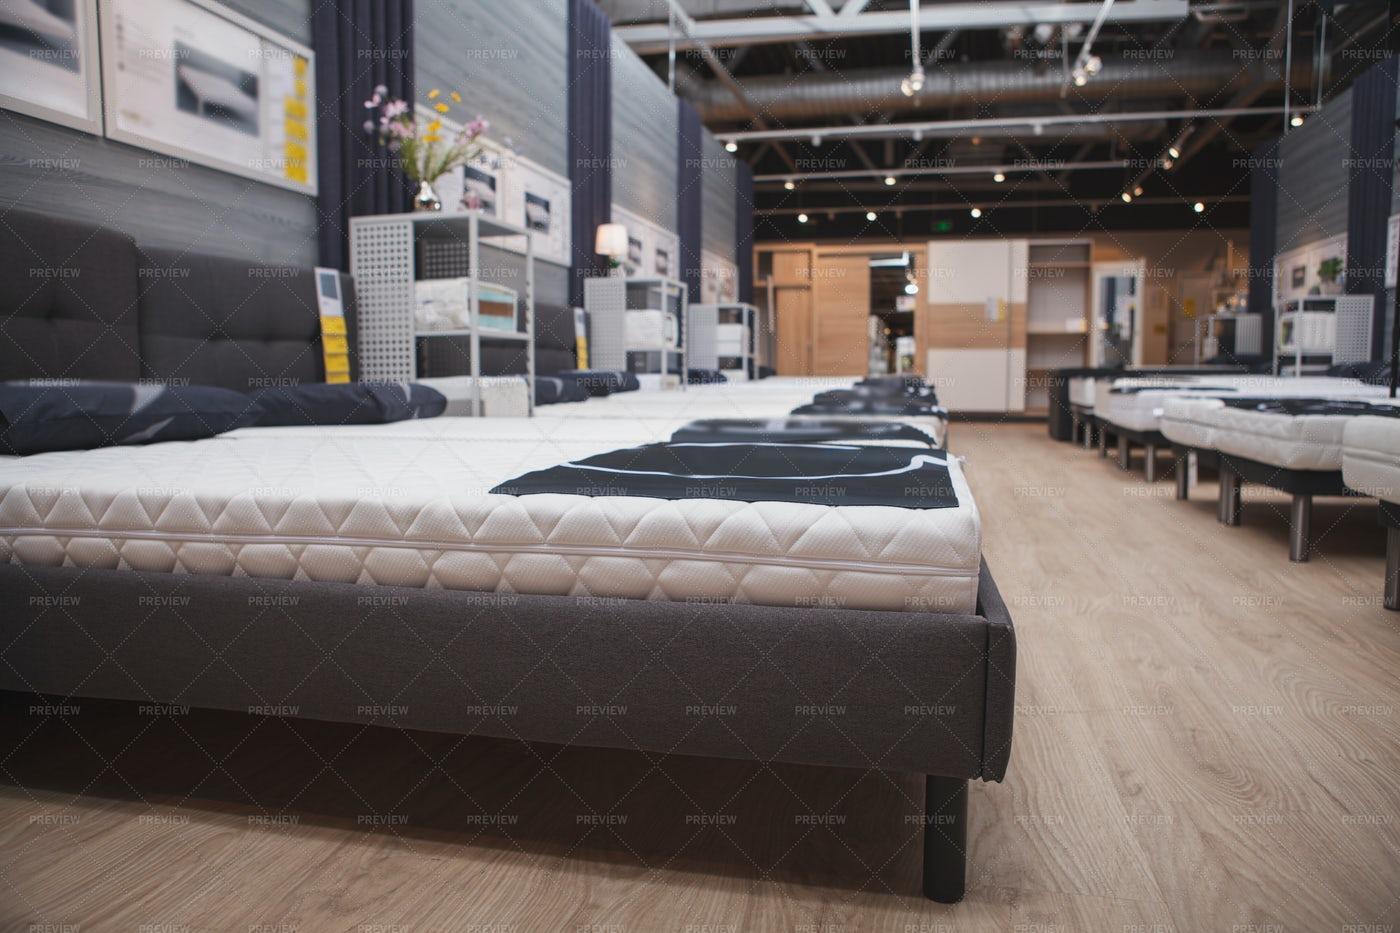 Beds At Furniture Store: Stock Photos